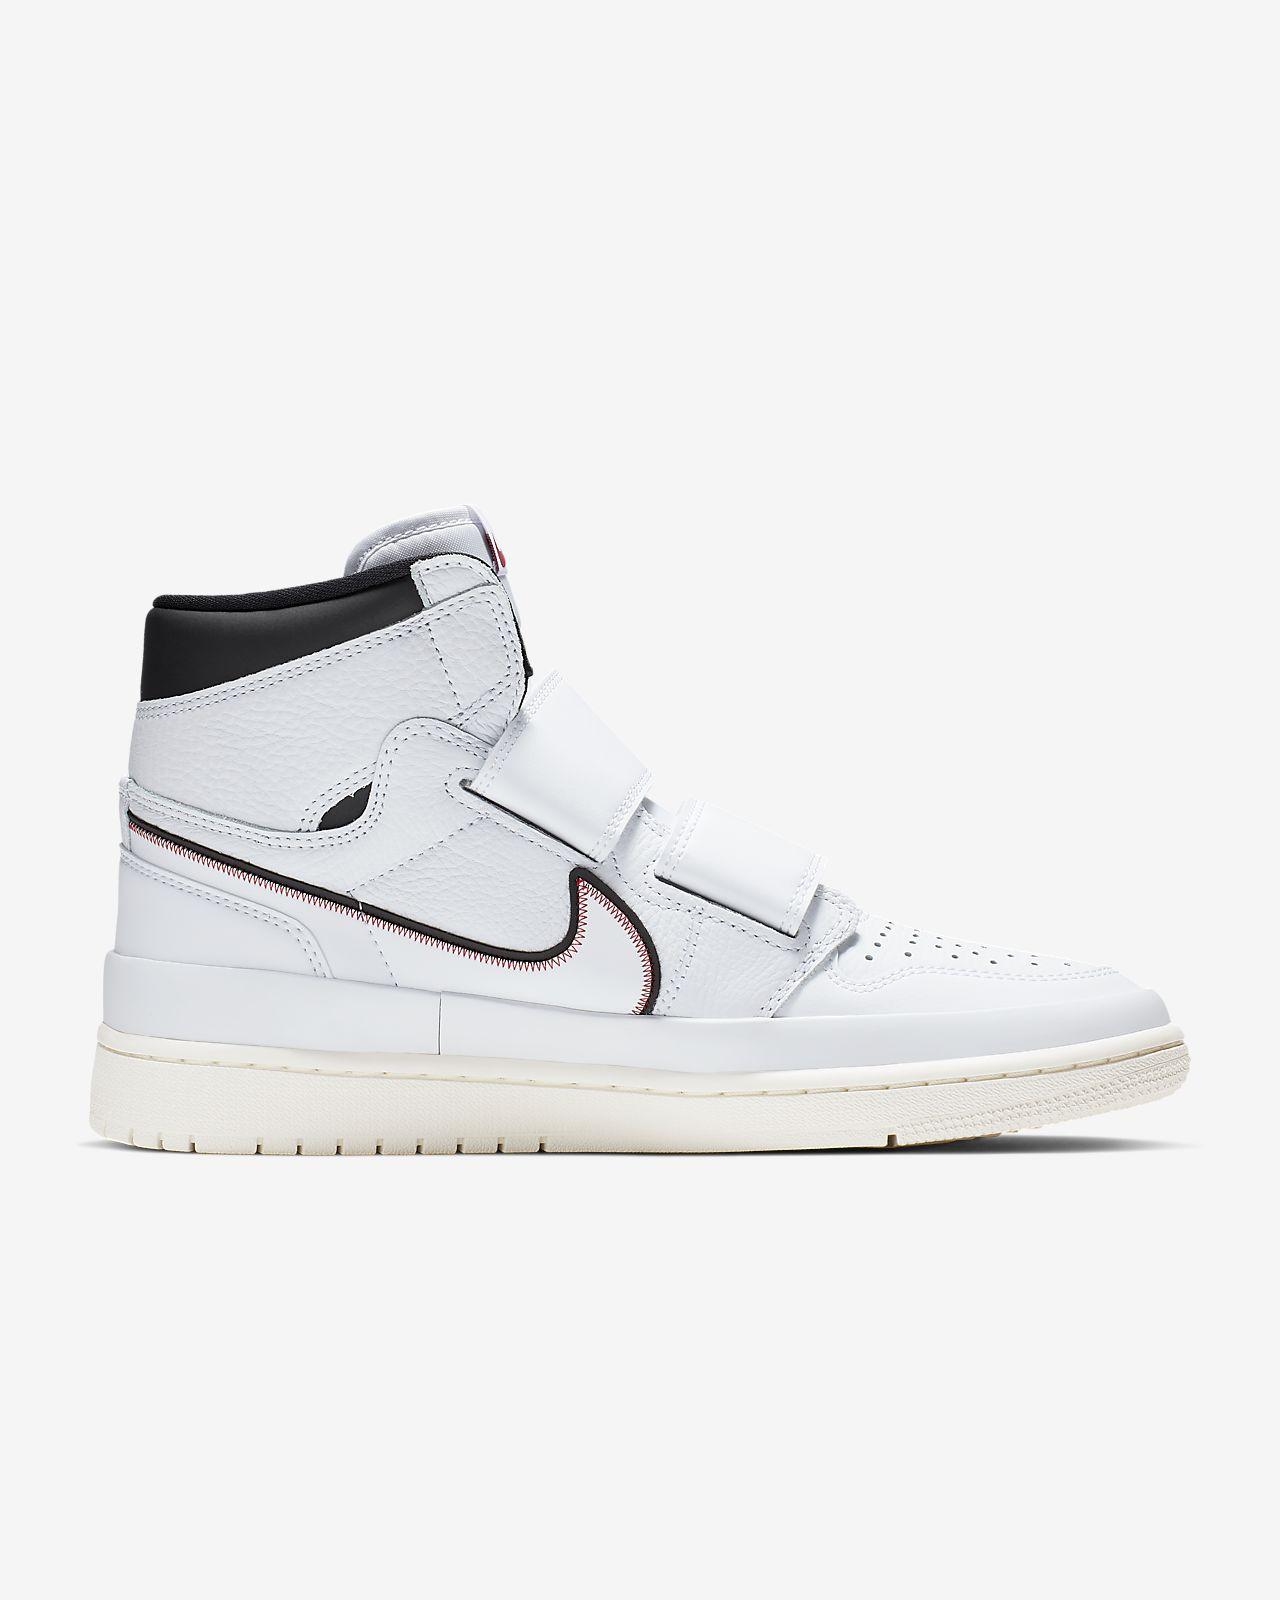 promo code 181b4 e8d30 Chaussure Air Jordan 1 Retro High Double Strap pour Homme. Nike.com CA